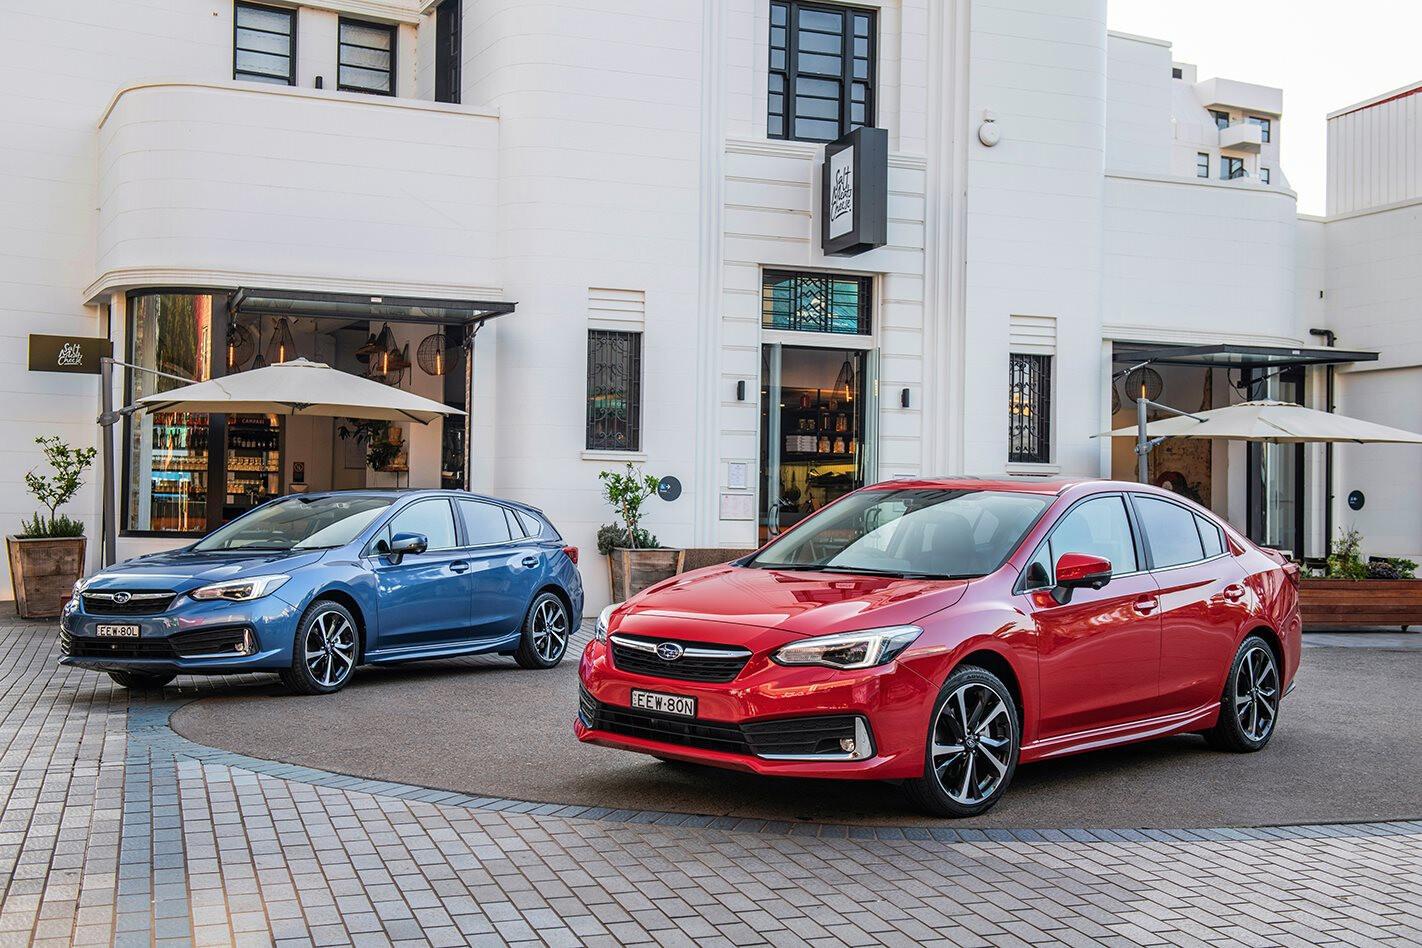 2020 Subaru Impreza hatchback and sedan